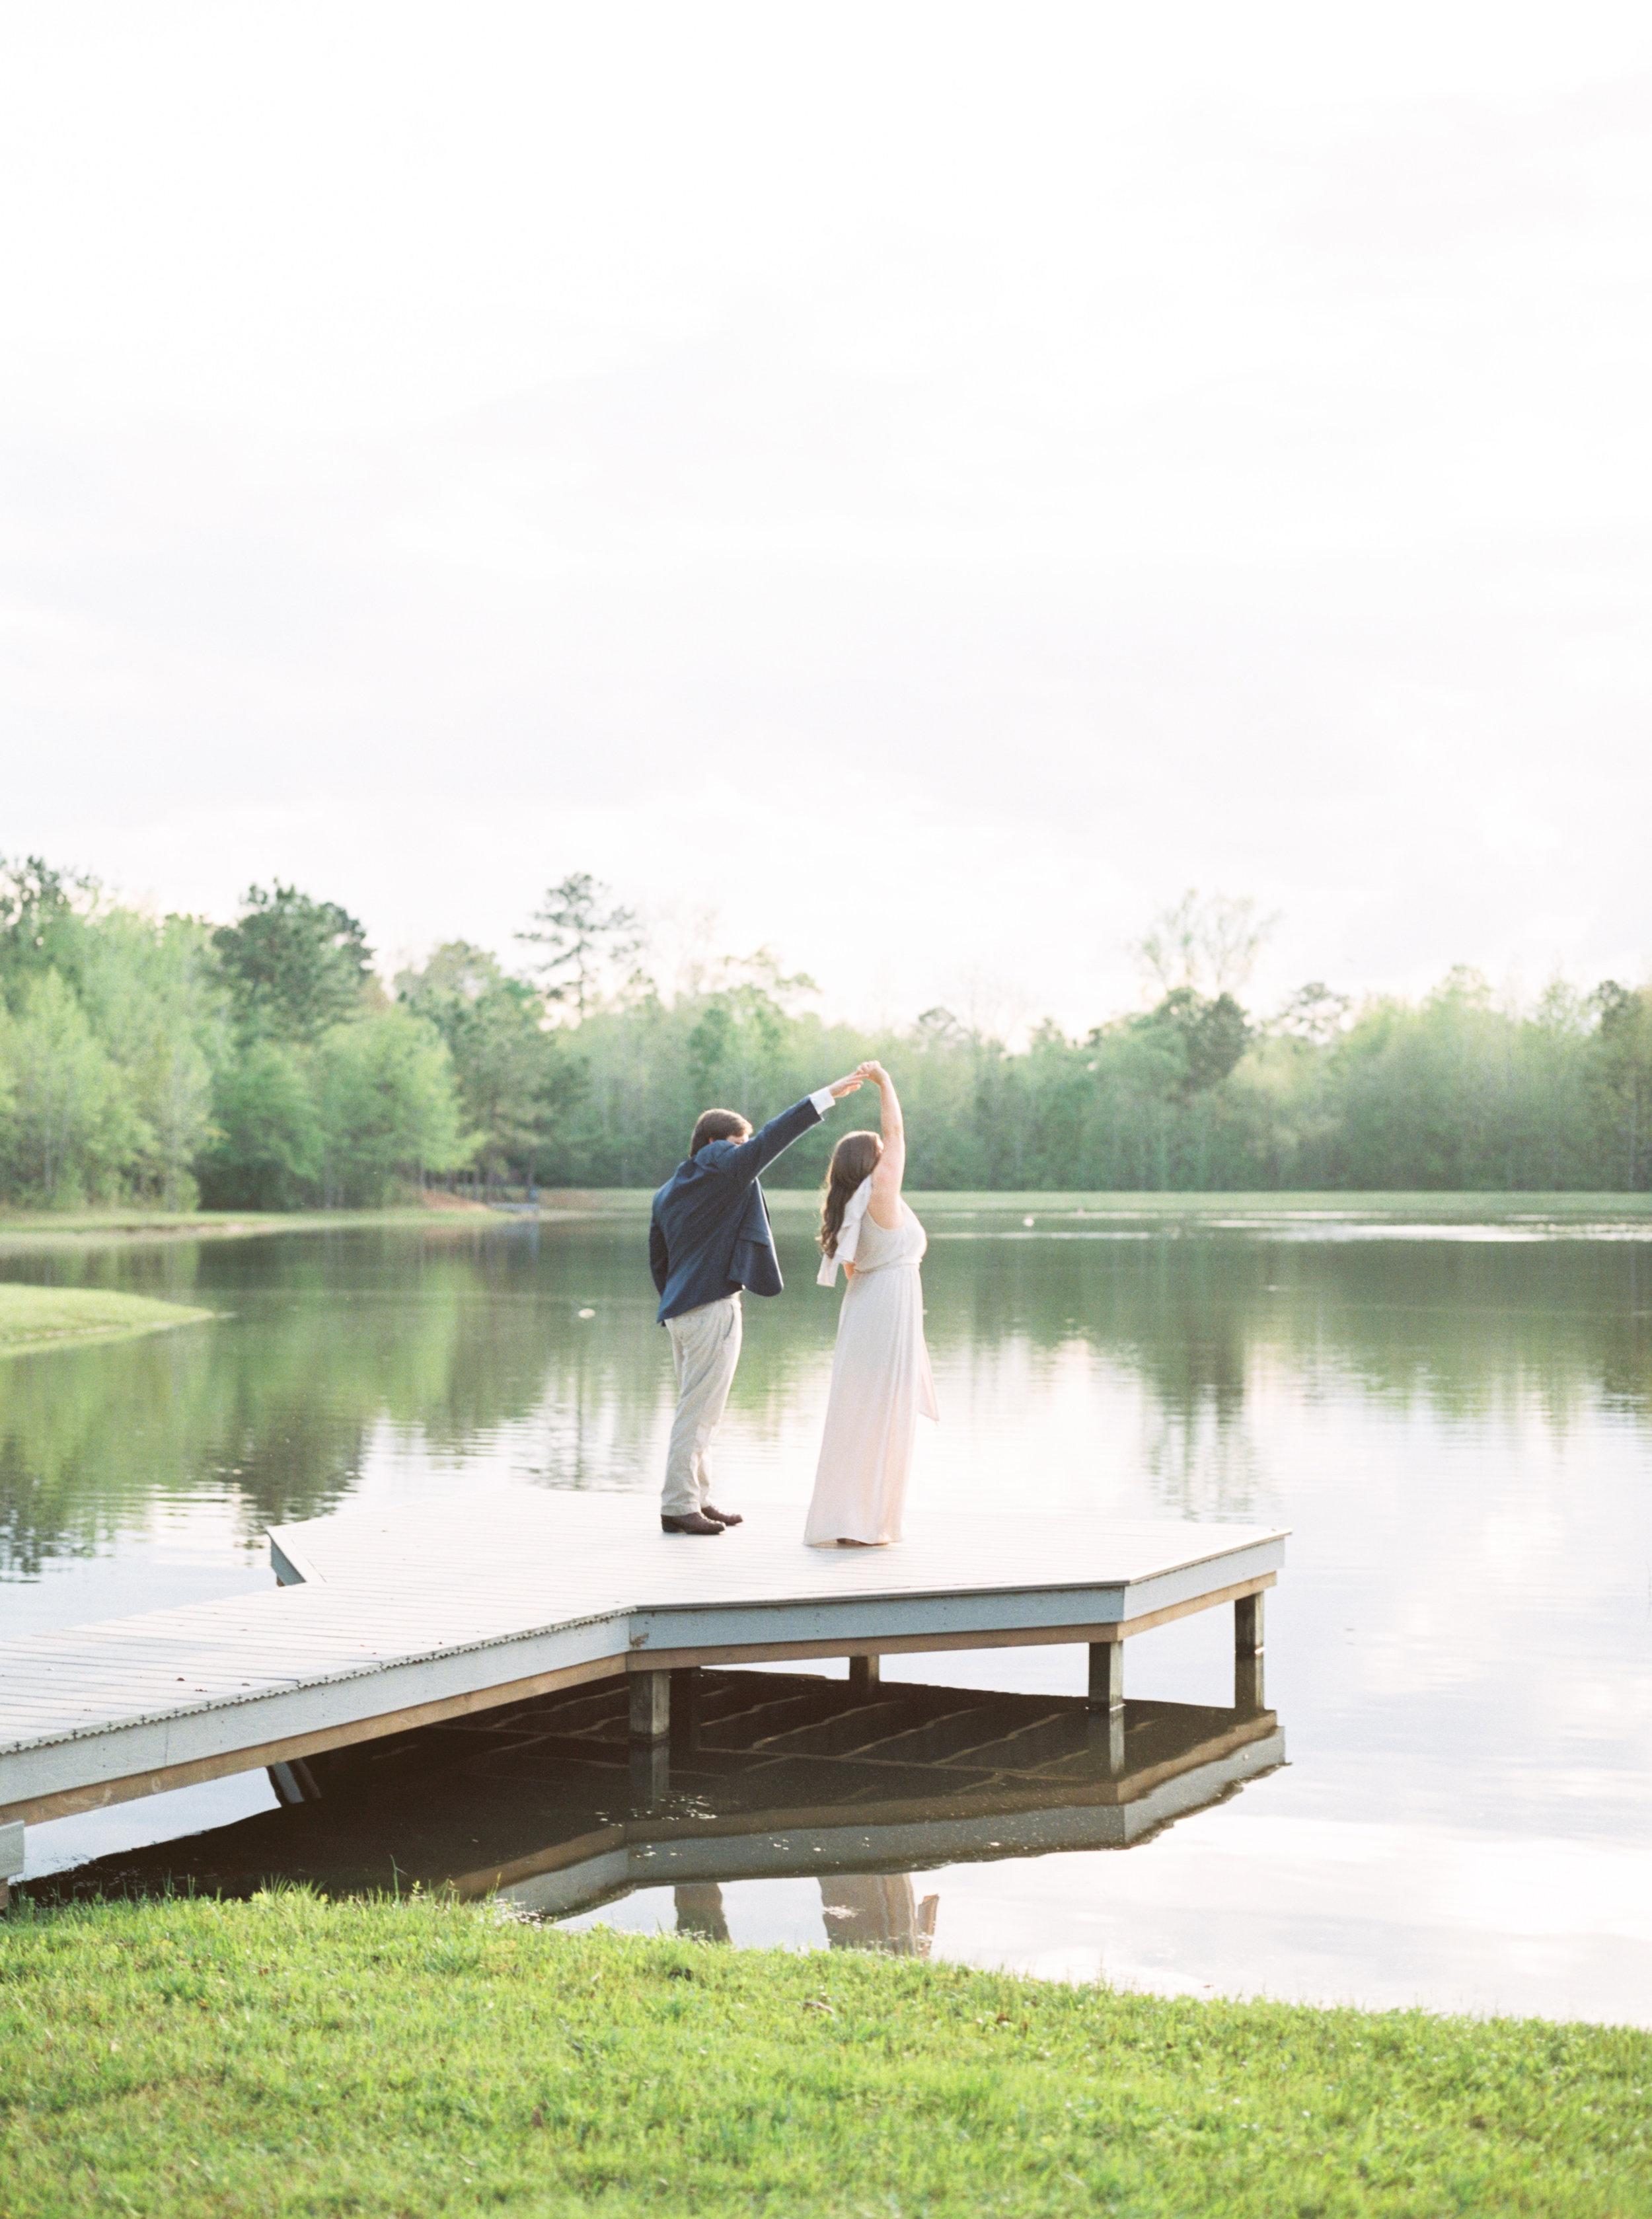 Landon_Grant_Carter_Film_Engagement_Session_Lake_Fallen_Photography_Columbus_Georgia-48.JPG